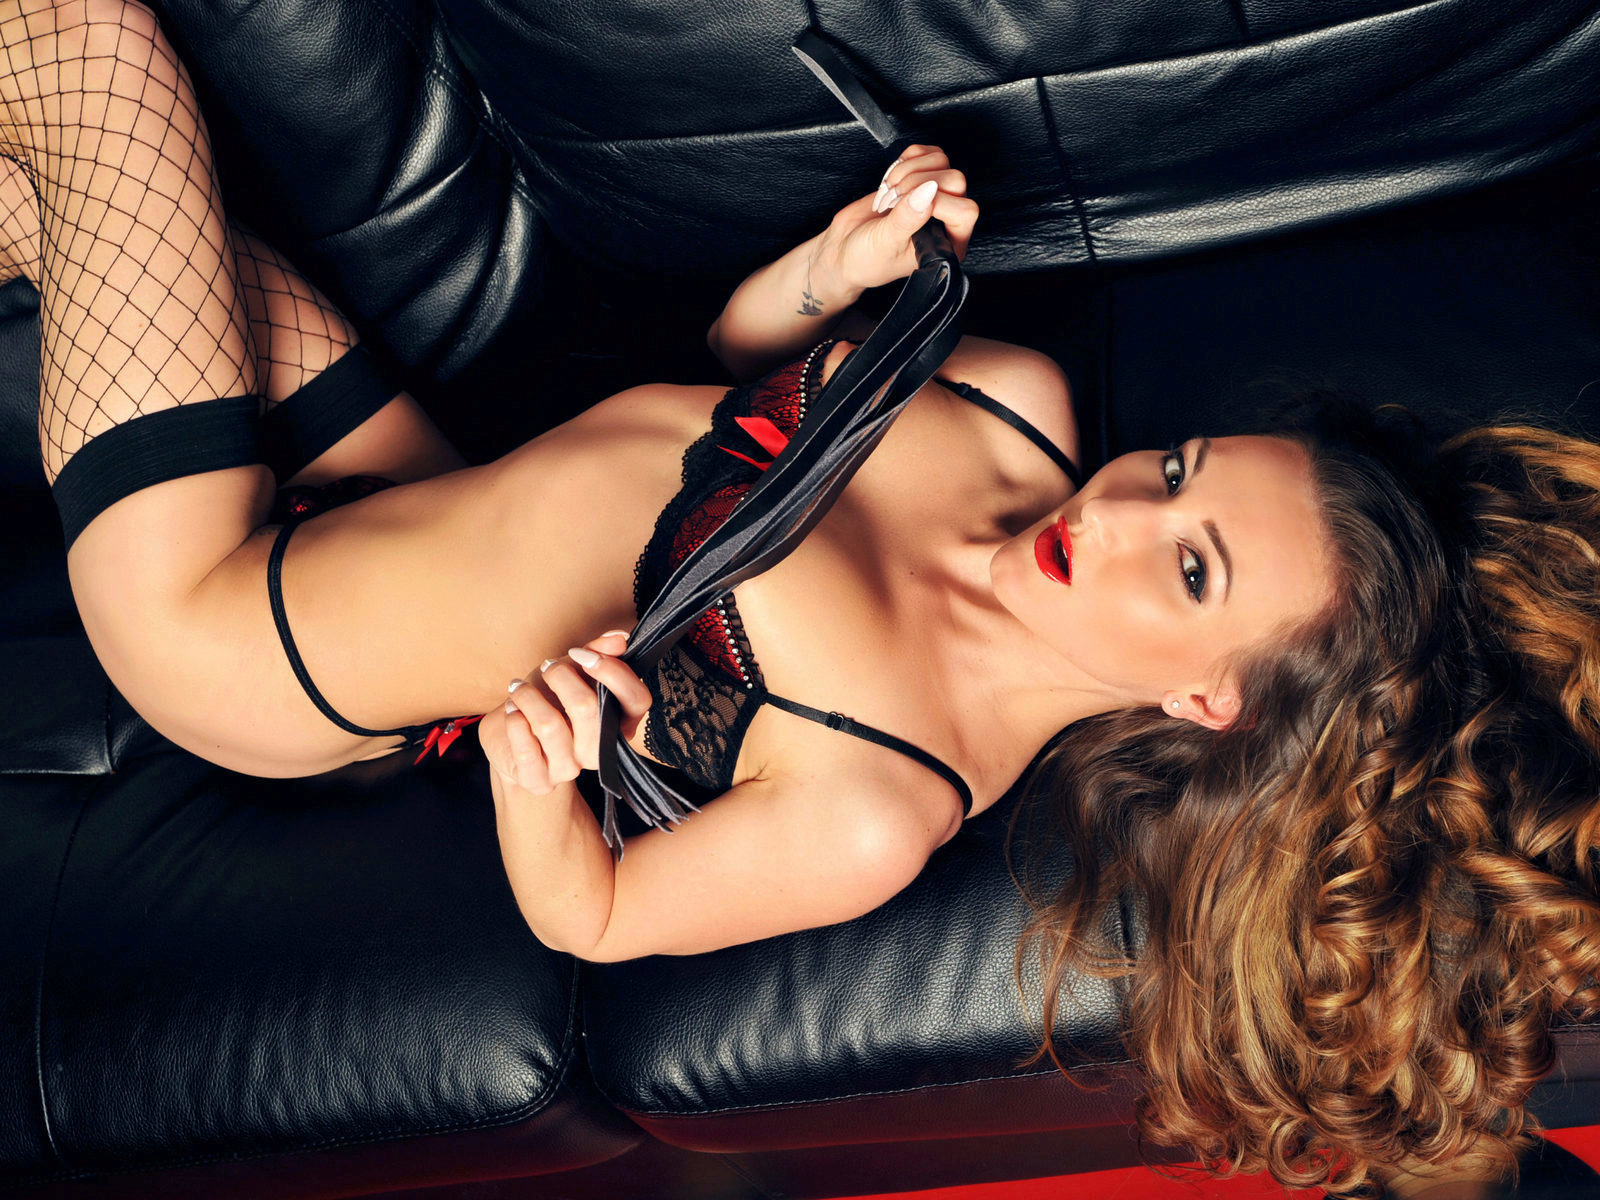 Webcam model Diana Rosex from WebPowerCam